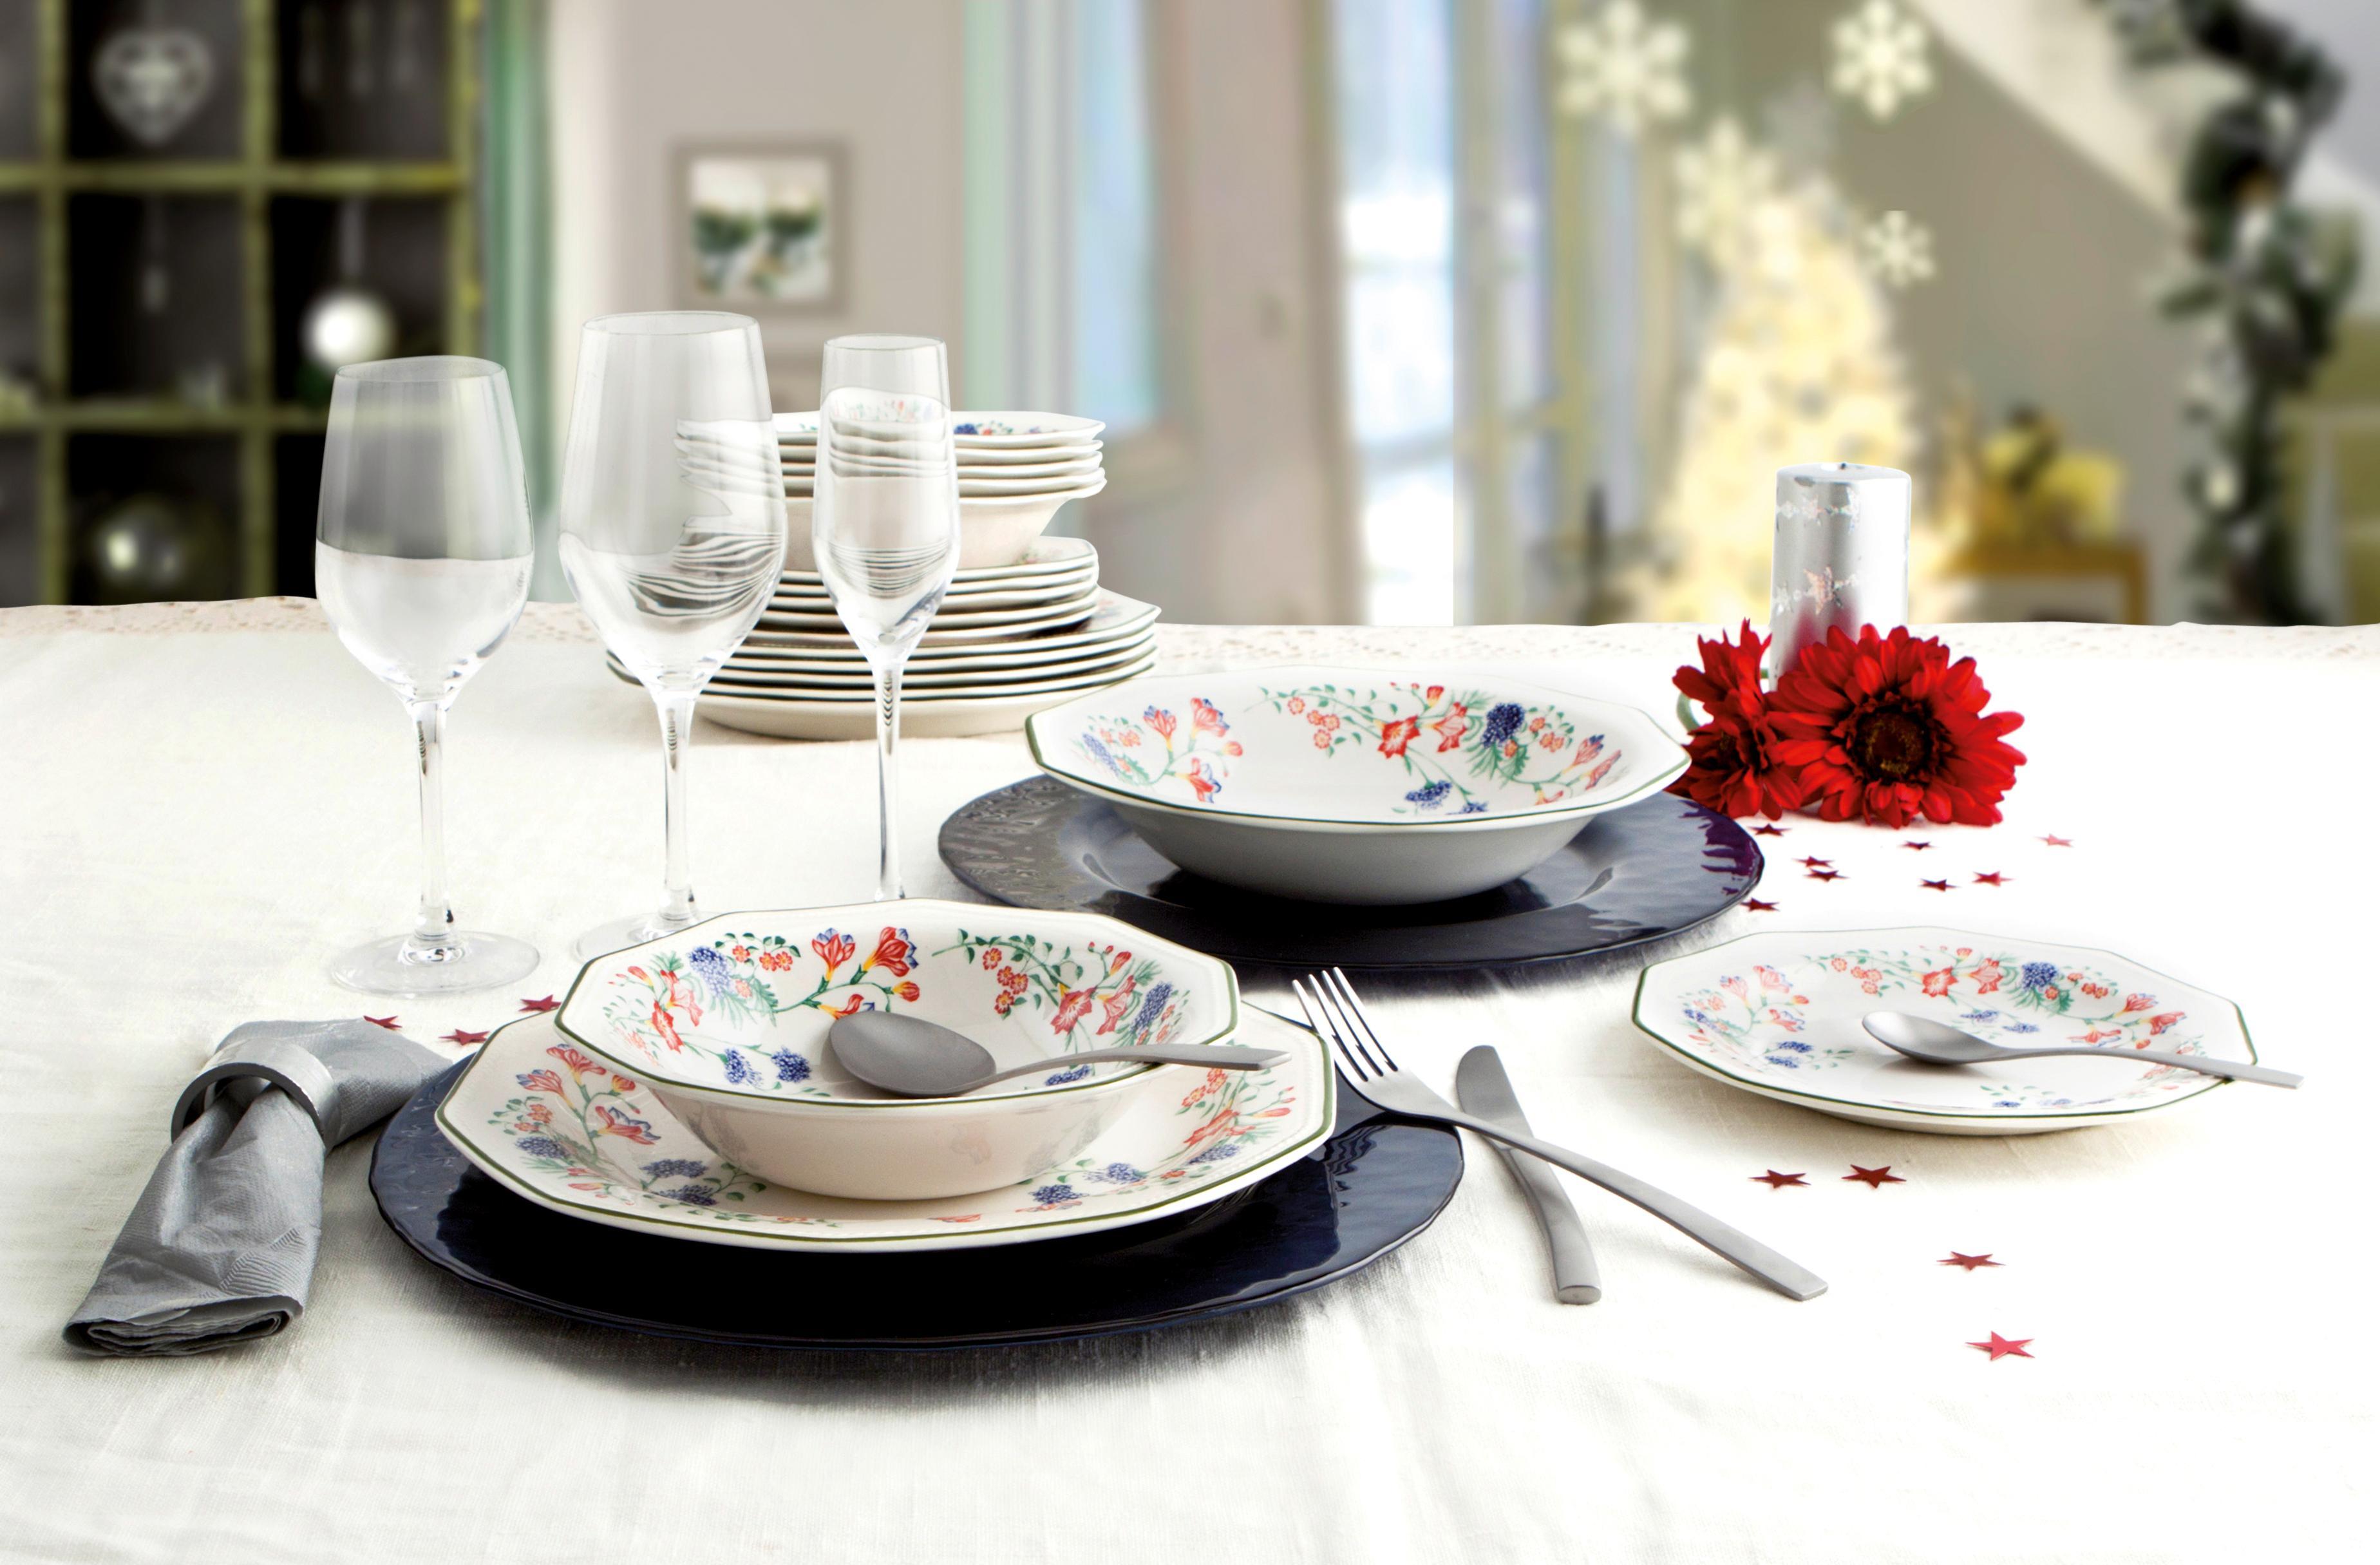 Churchill emily vajilla de loza inglesa tama o 18 piezas decorado floral hogar - Vajilla inglesa ...